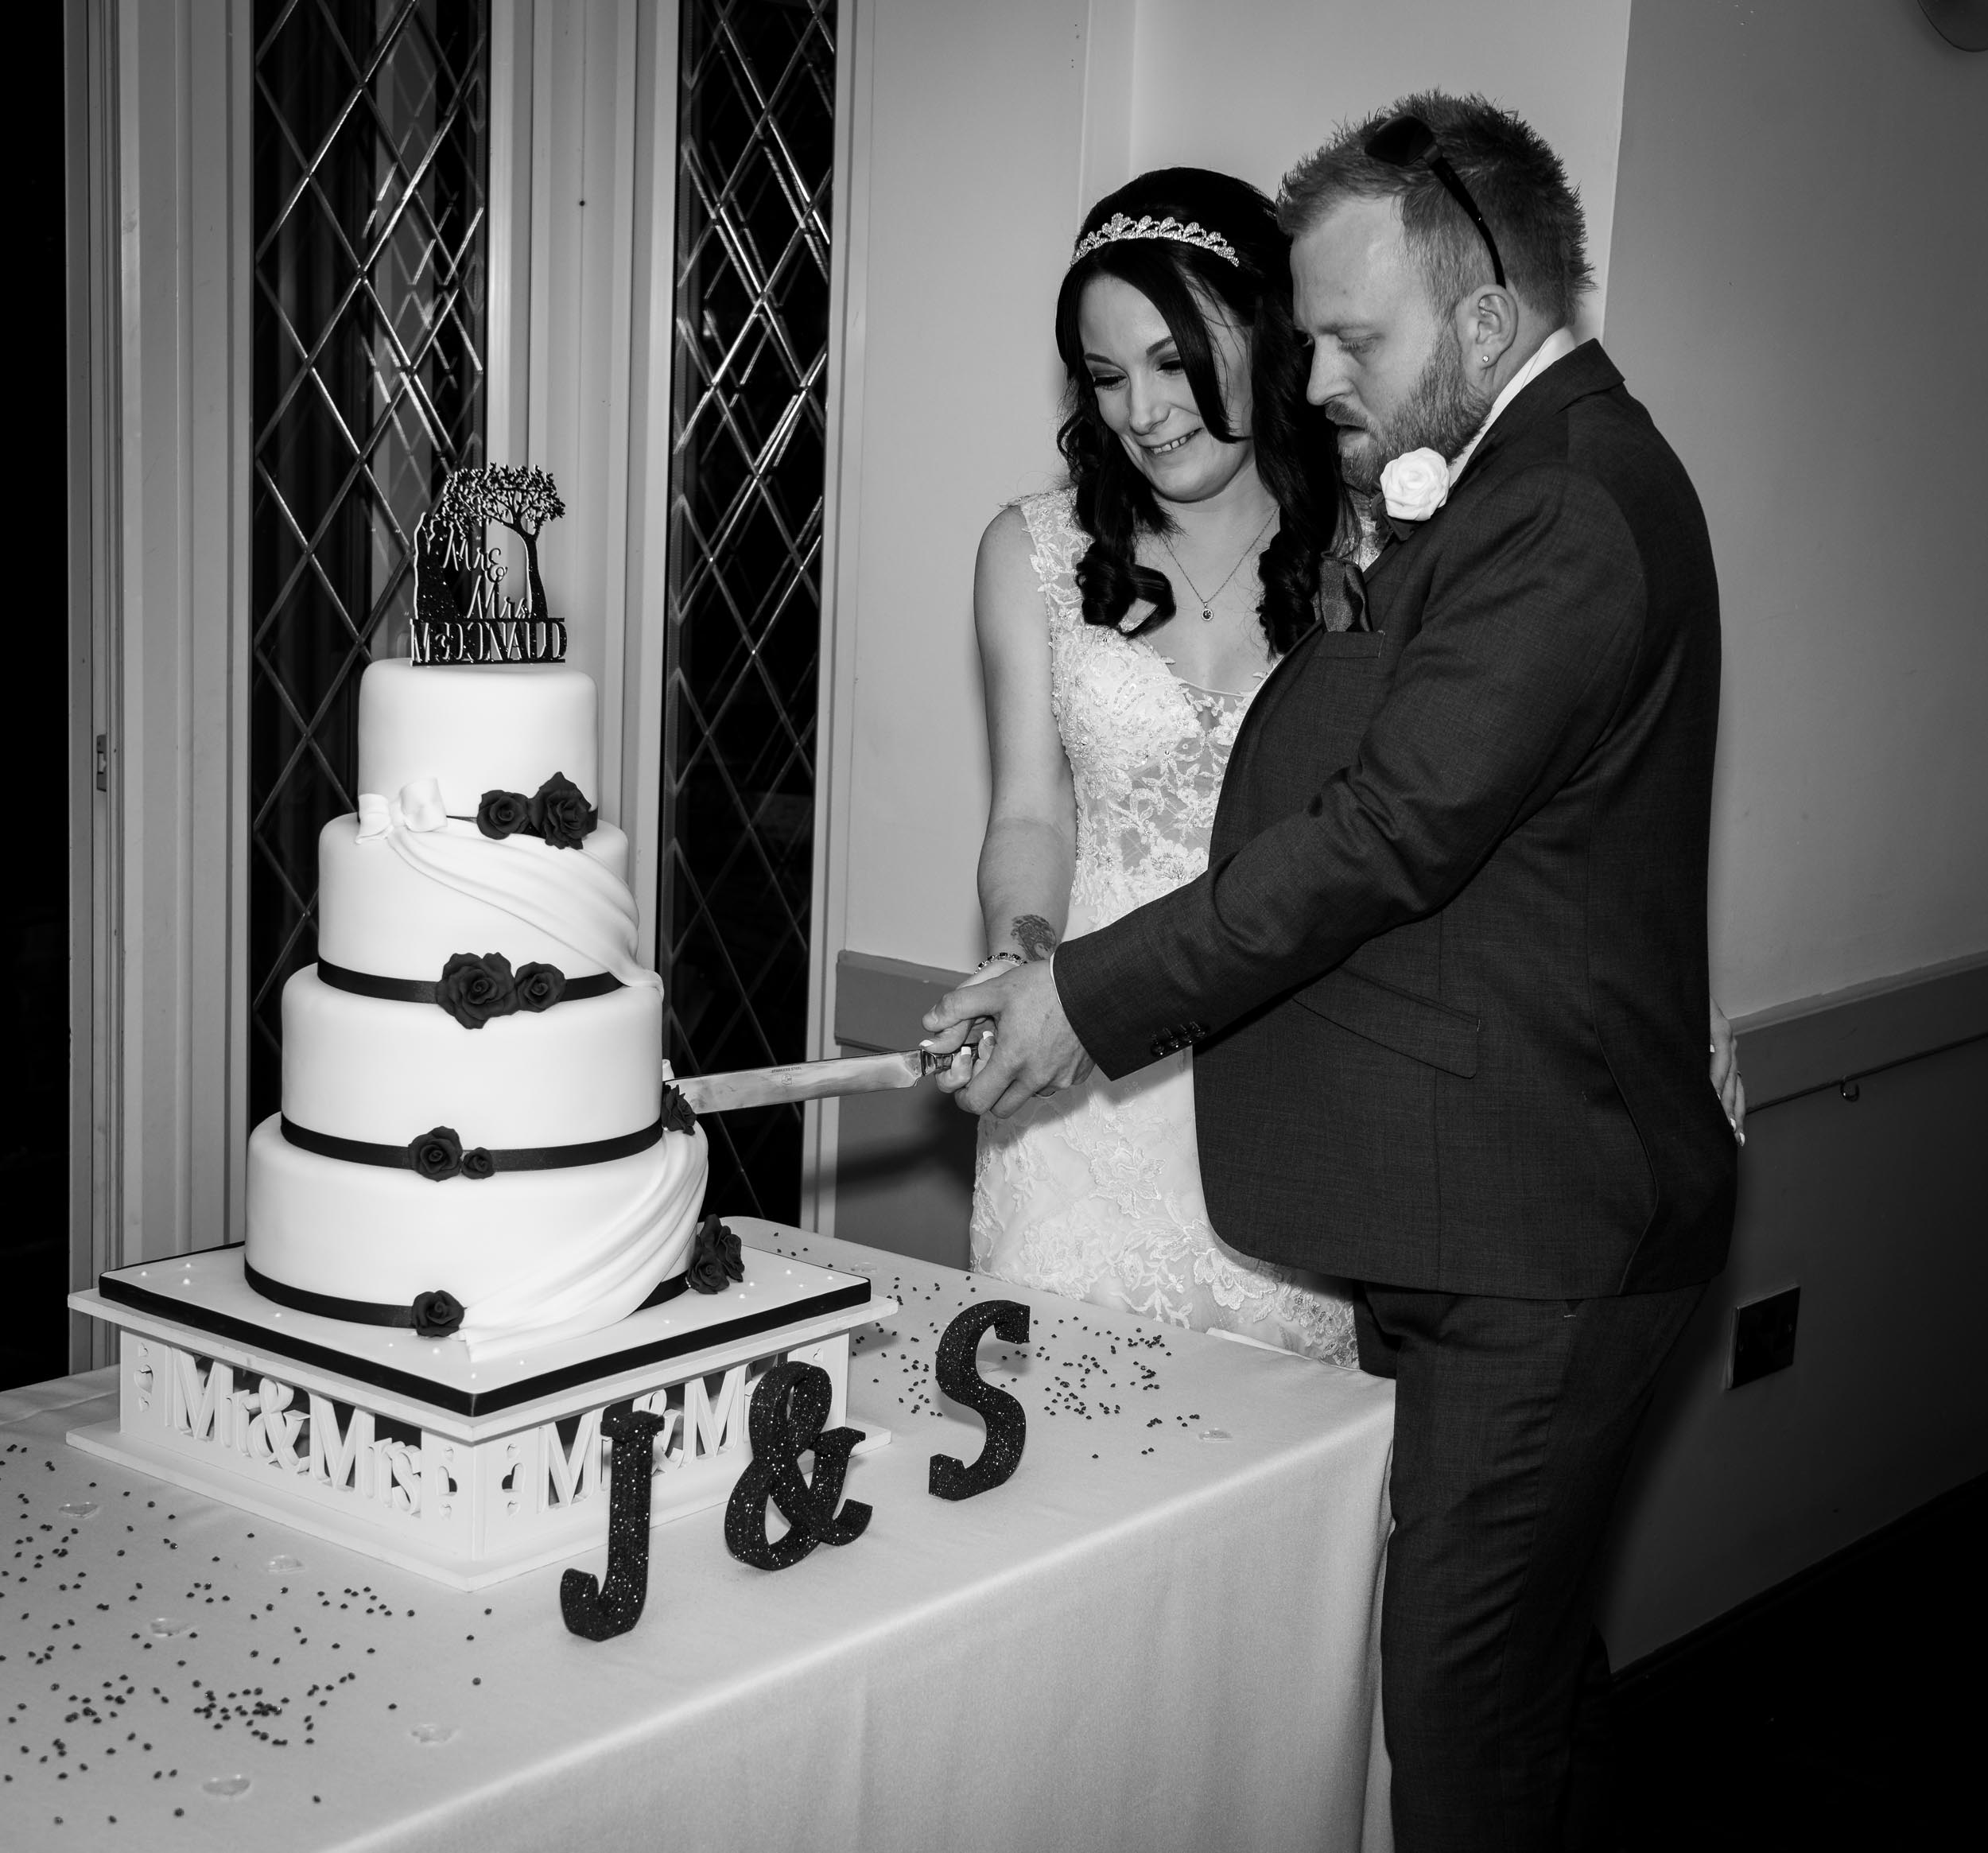 190420-Wedding-evening-reception-The-Old-Rectory-038.jpg